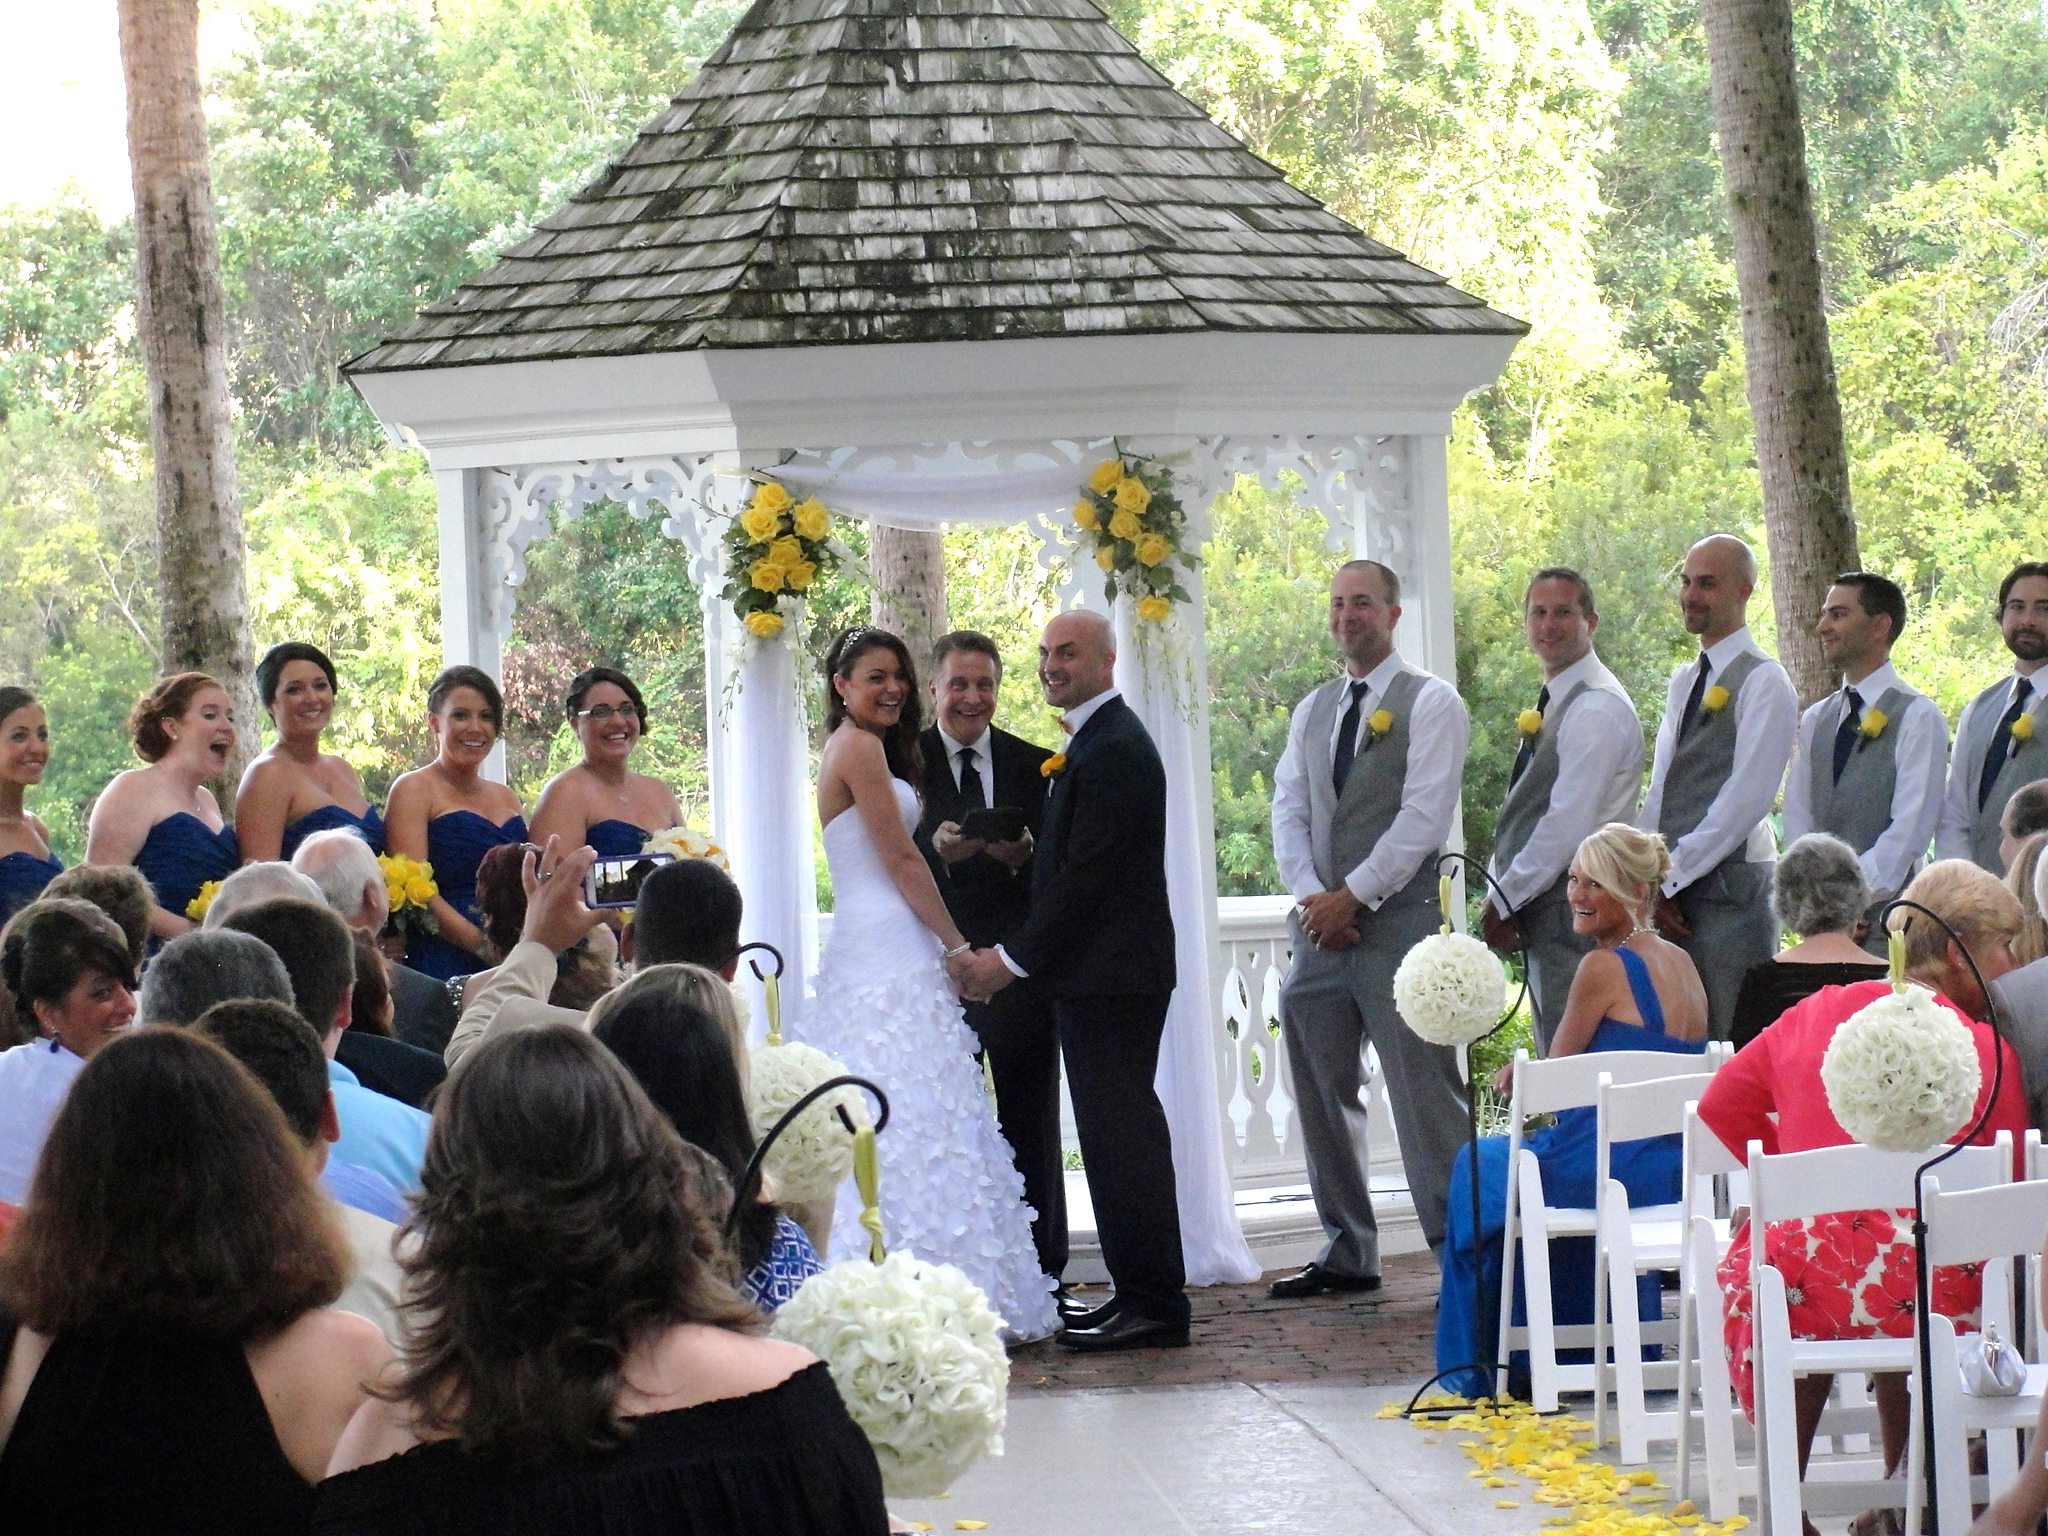 Soundwave-DJ-LED-Lighting-Orlando-wedding-Buena-Vista-Palace